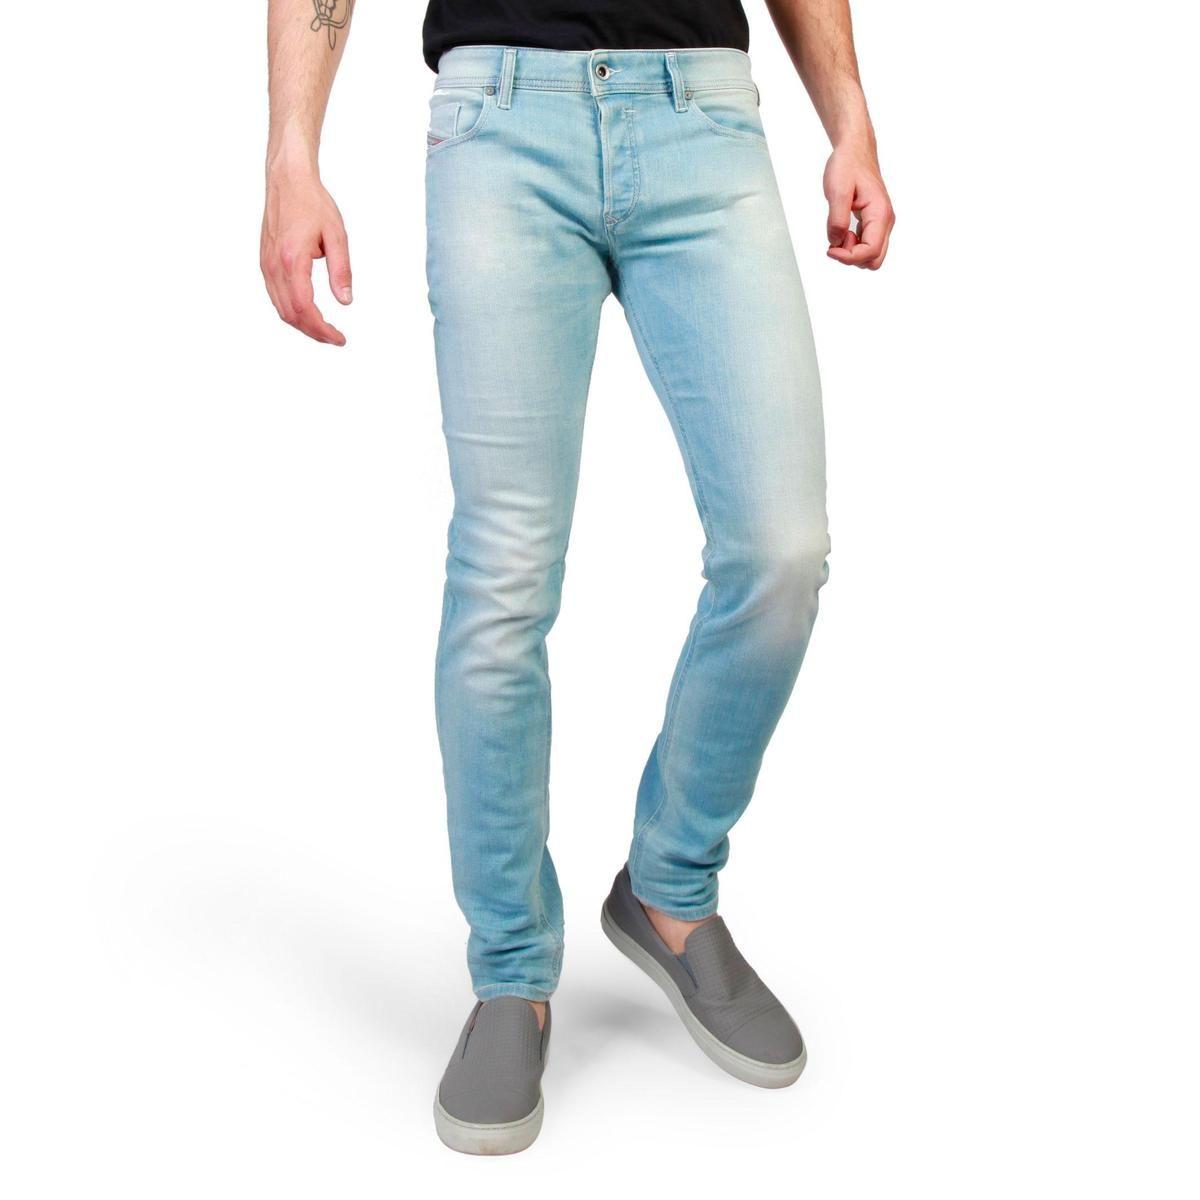 Skinny Chiusura Chiusura Uomo Uomo Skinny Jeans Skinny Chiusura Bottoni Uomo Jeans Jeans Bottoni cq4SR35AjL